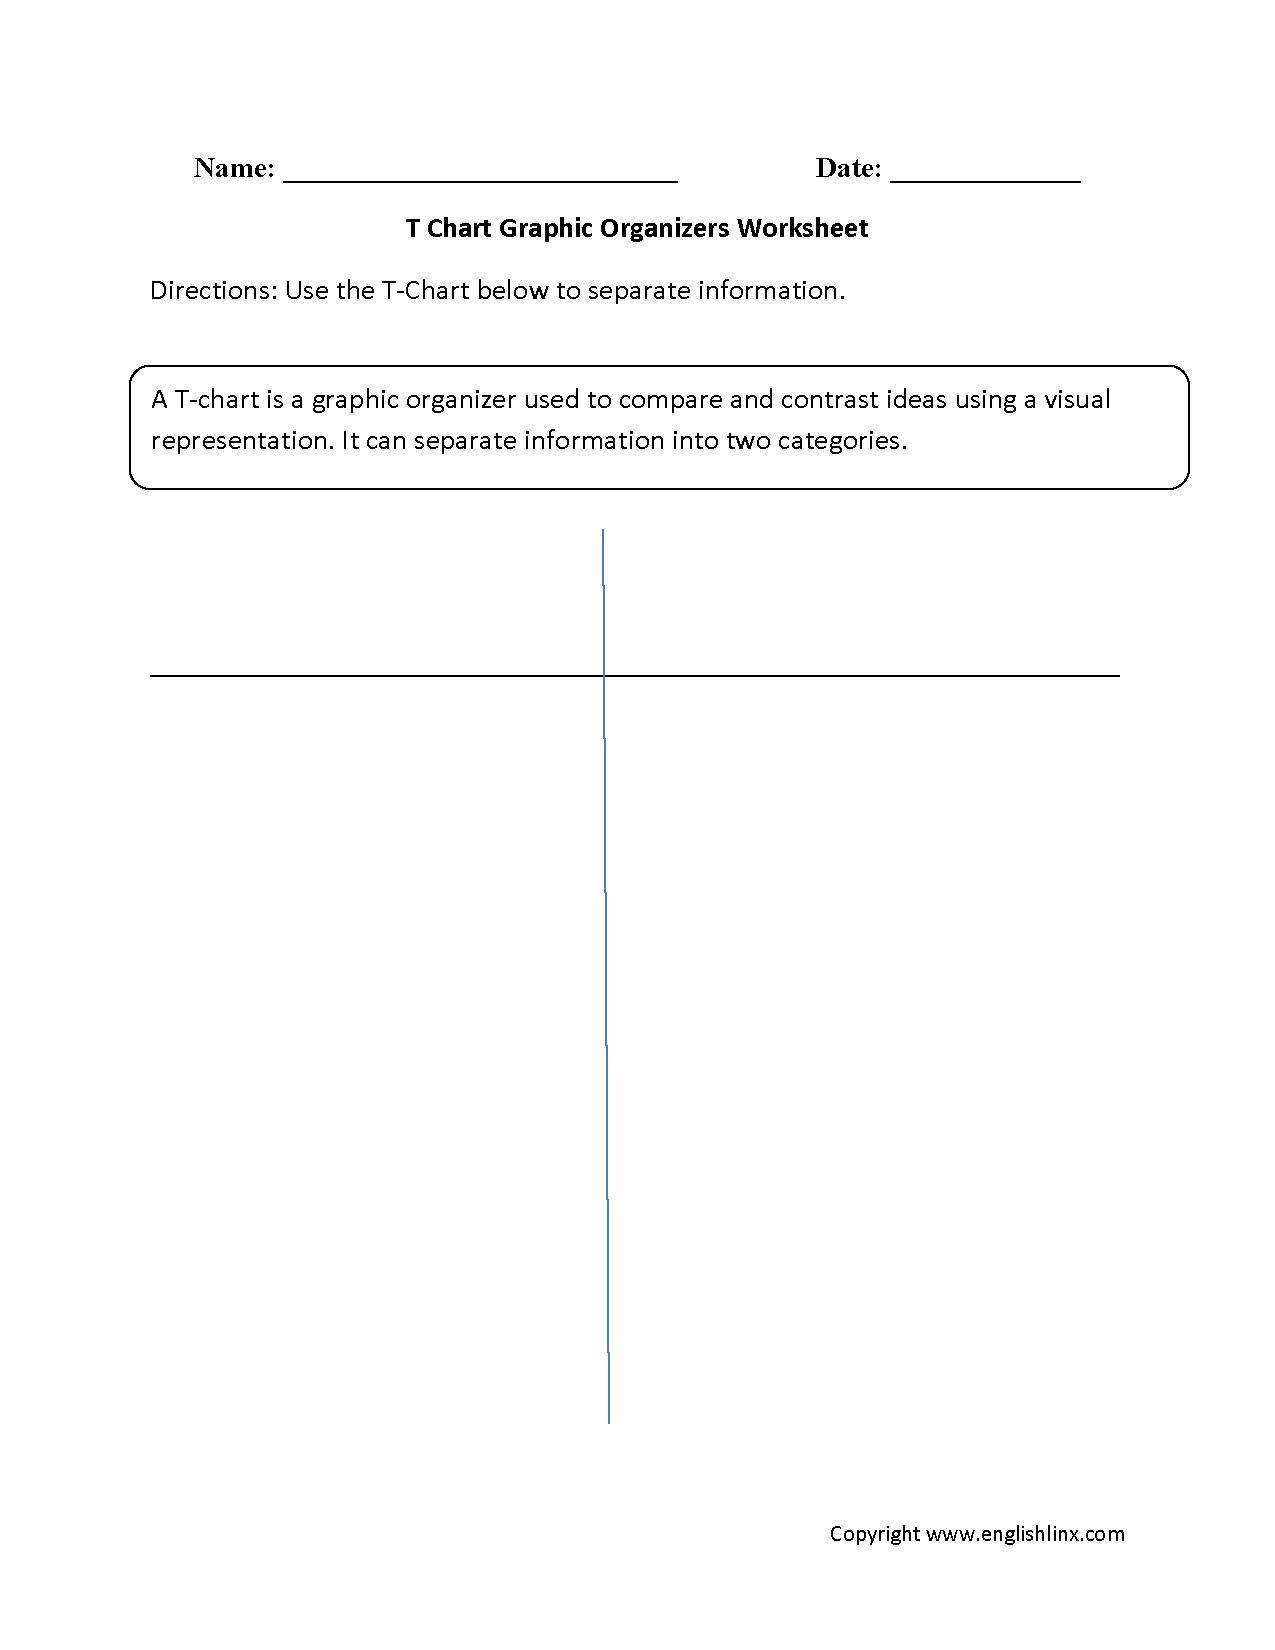 Englishlinx   Graphic Organizers Worksheets - Free Printable Main Idea Graphic Organizer